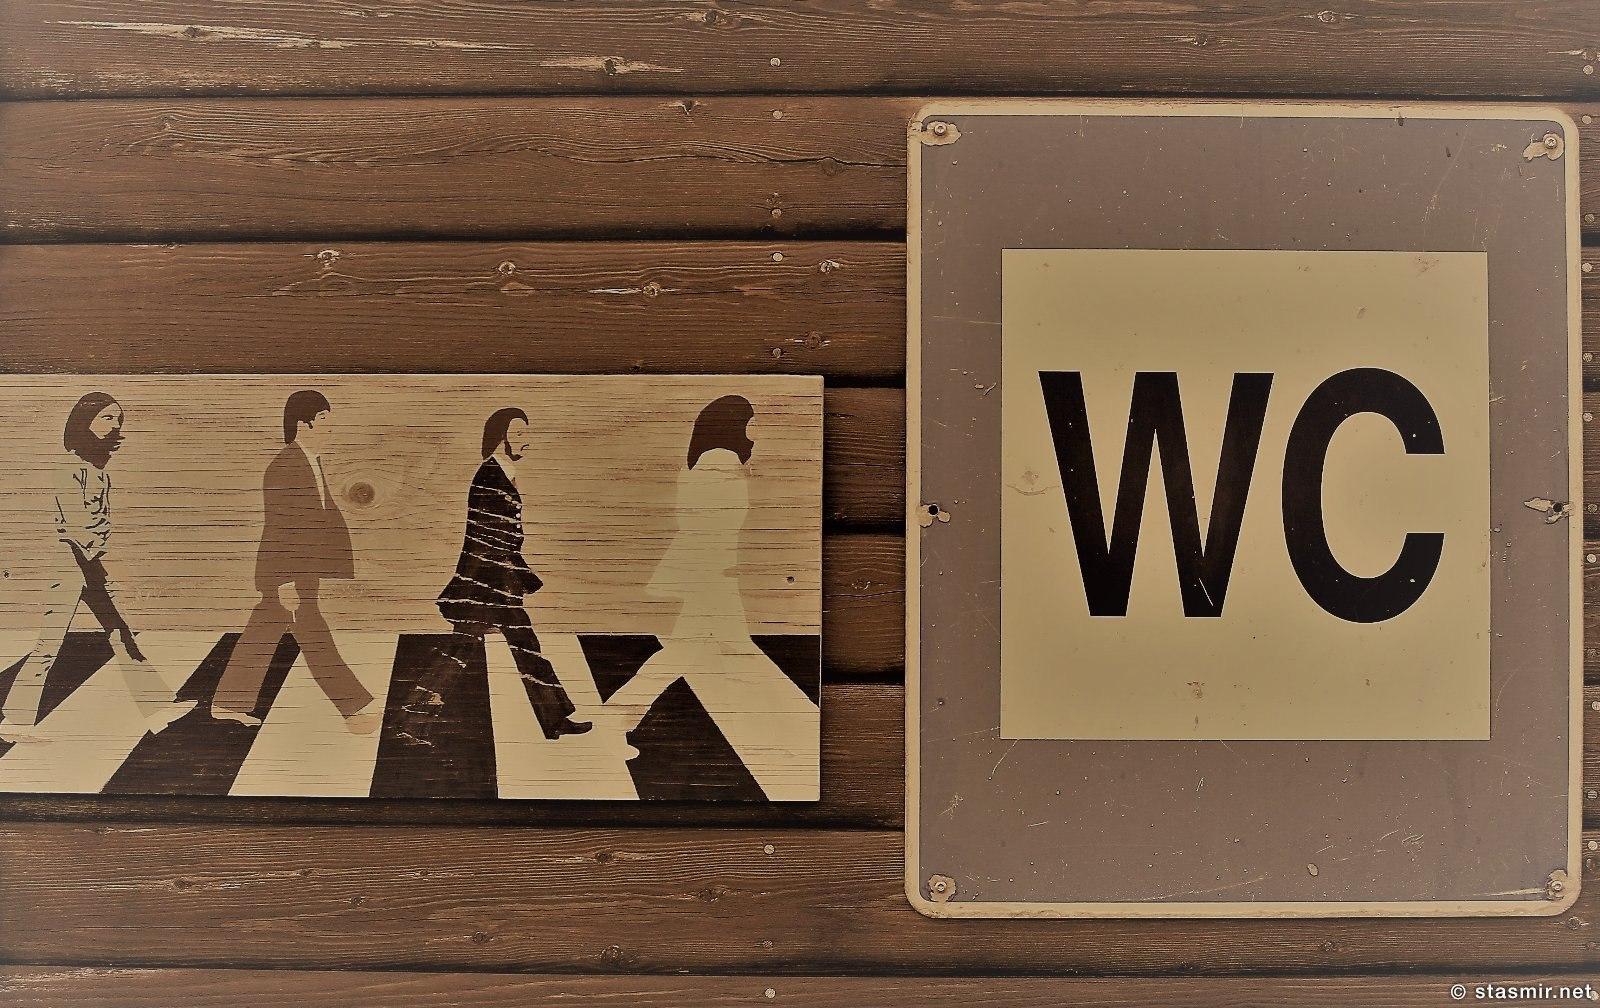 Битлы с Abbey Road идут в туалет на полуострове Рейкьянес в Исландии, фото Стасмир, photo Stasmir